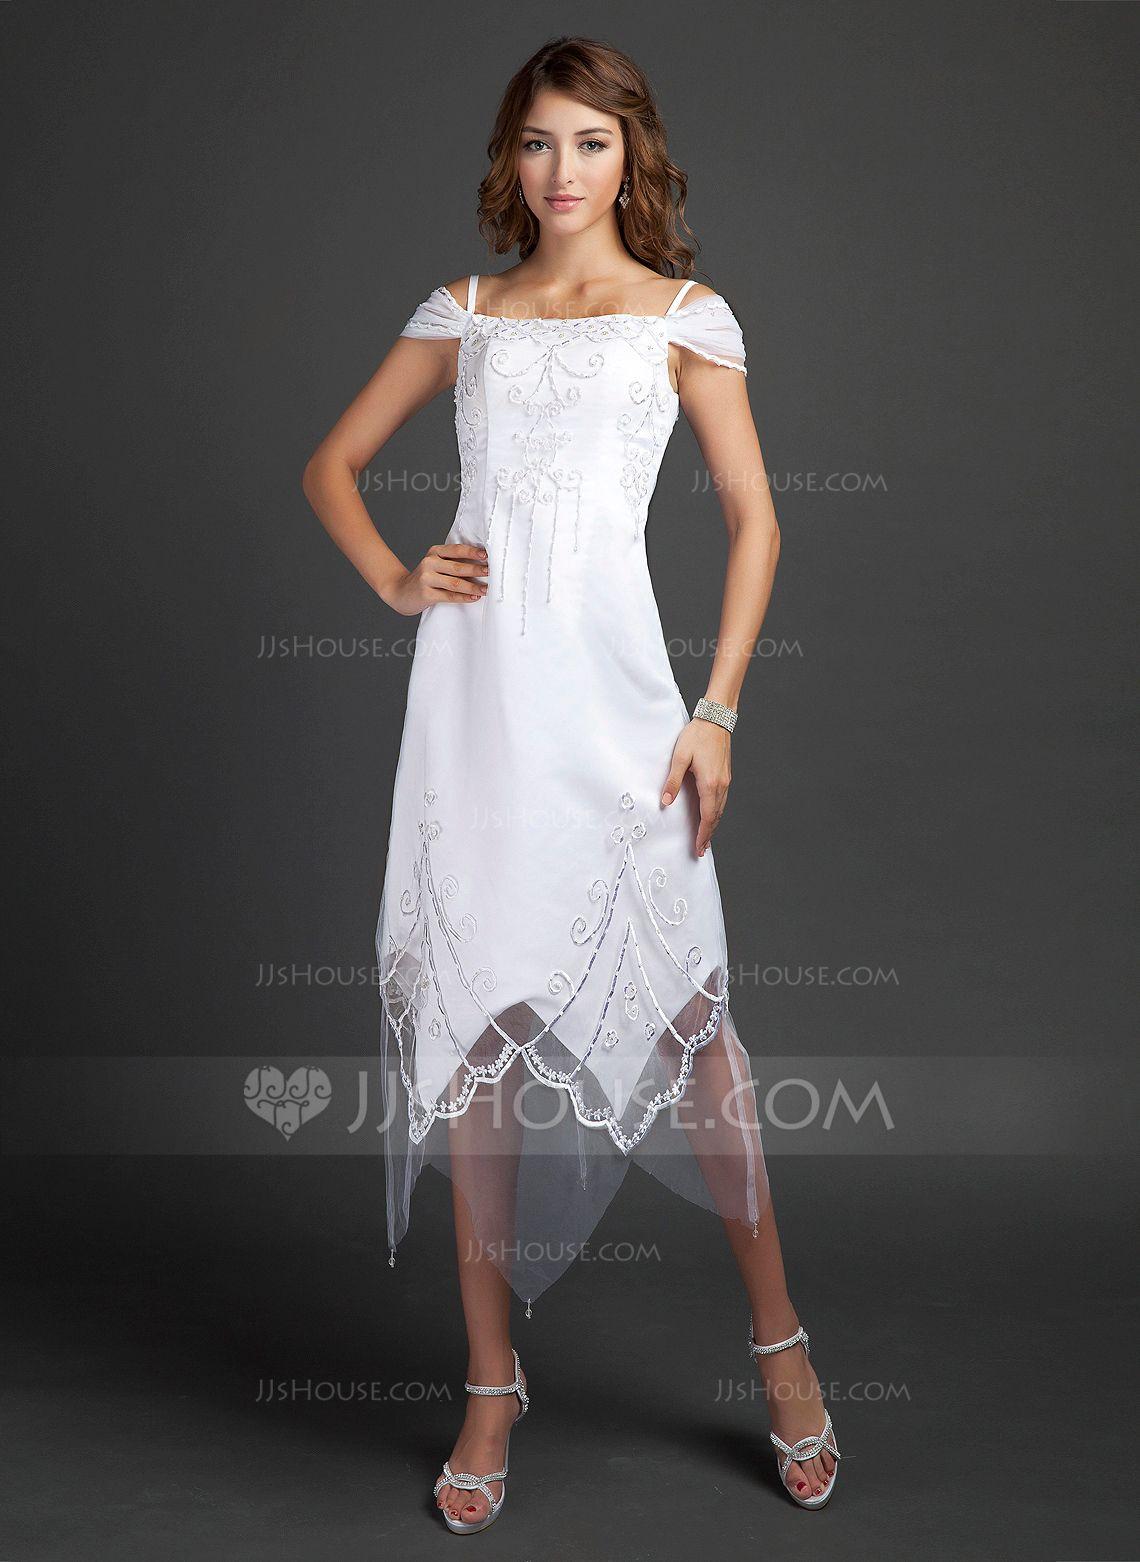 Off the shoulder tea length wedding dress  ALinePrincess OfftheShoulder TeaLength Satin Wedding Dress With